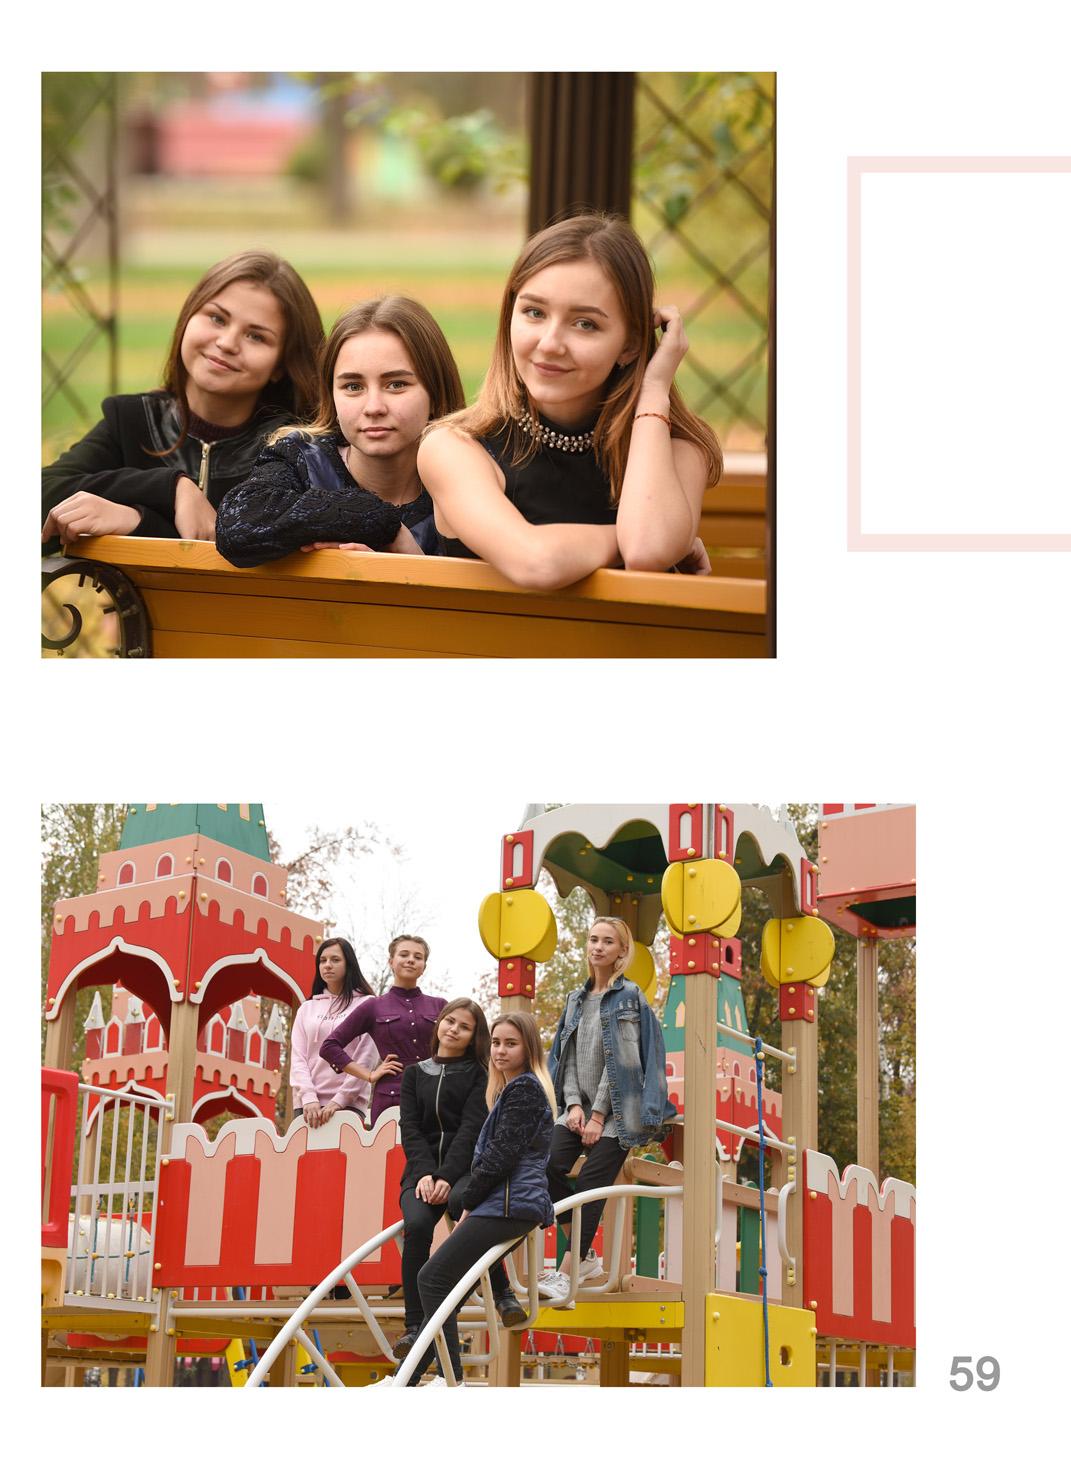 https://school-photo.com.ua/wp-content/uploads/2019/09/61-copy.jpg